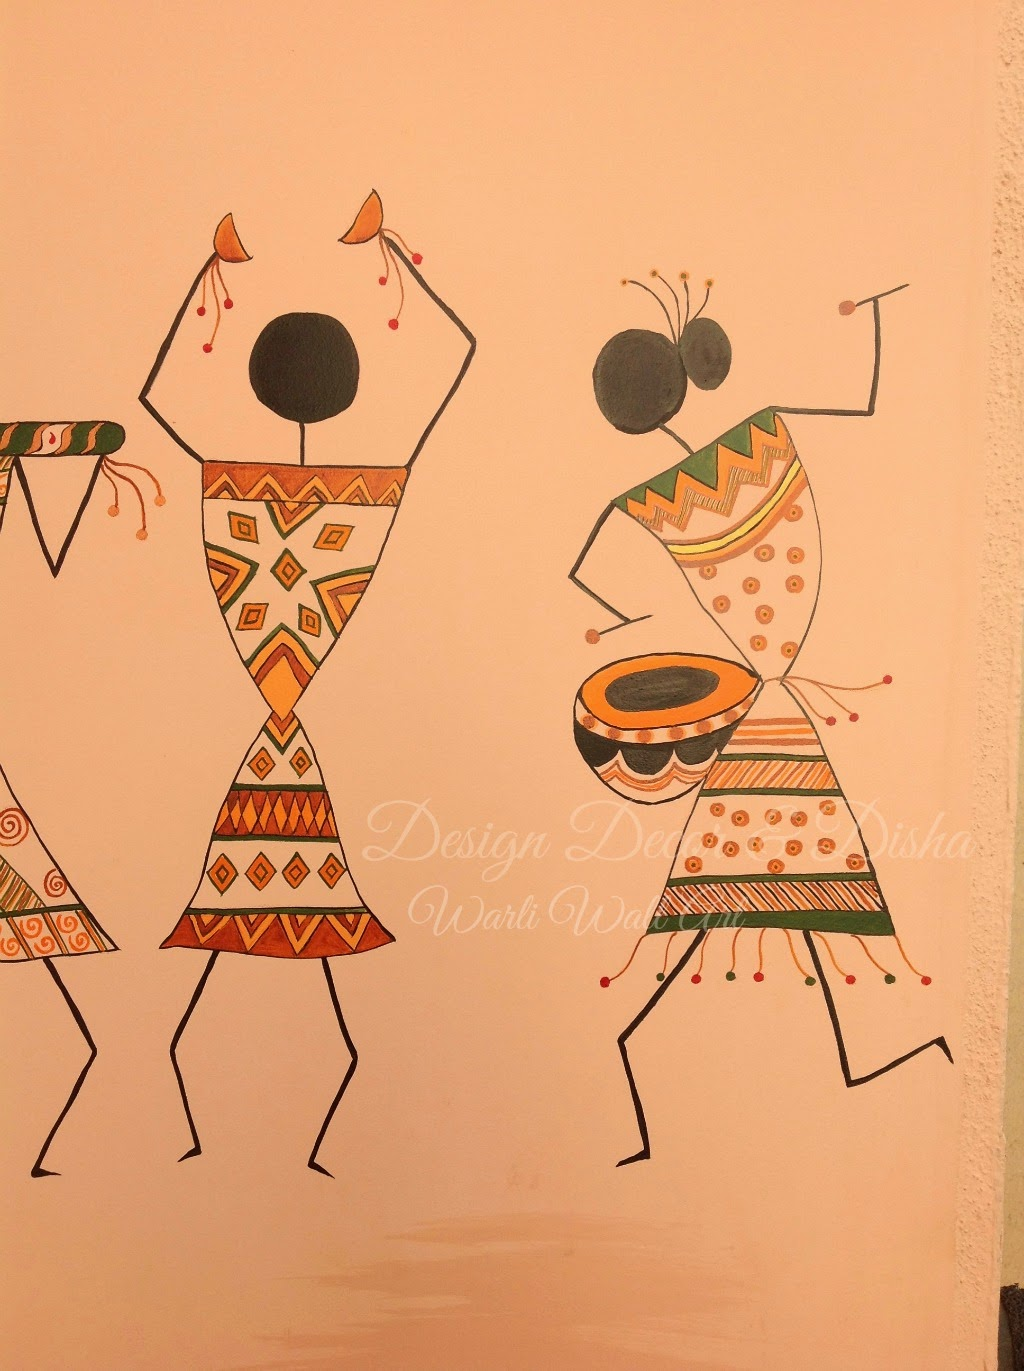 Design Decor & Disha | An Indian Design & Decor Blog: My ...